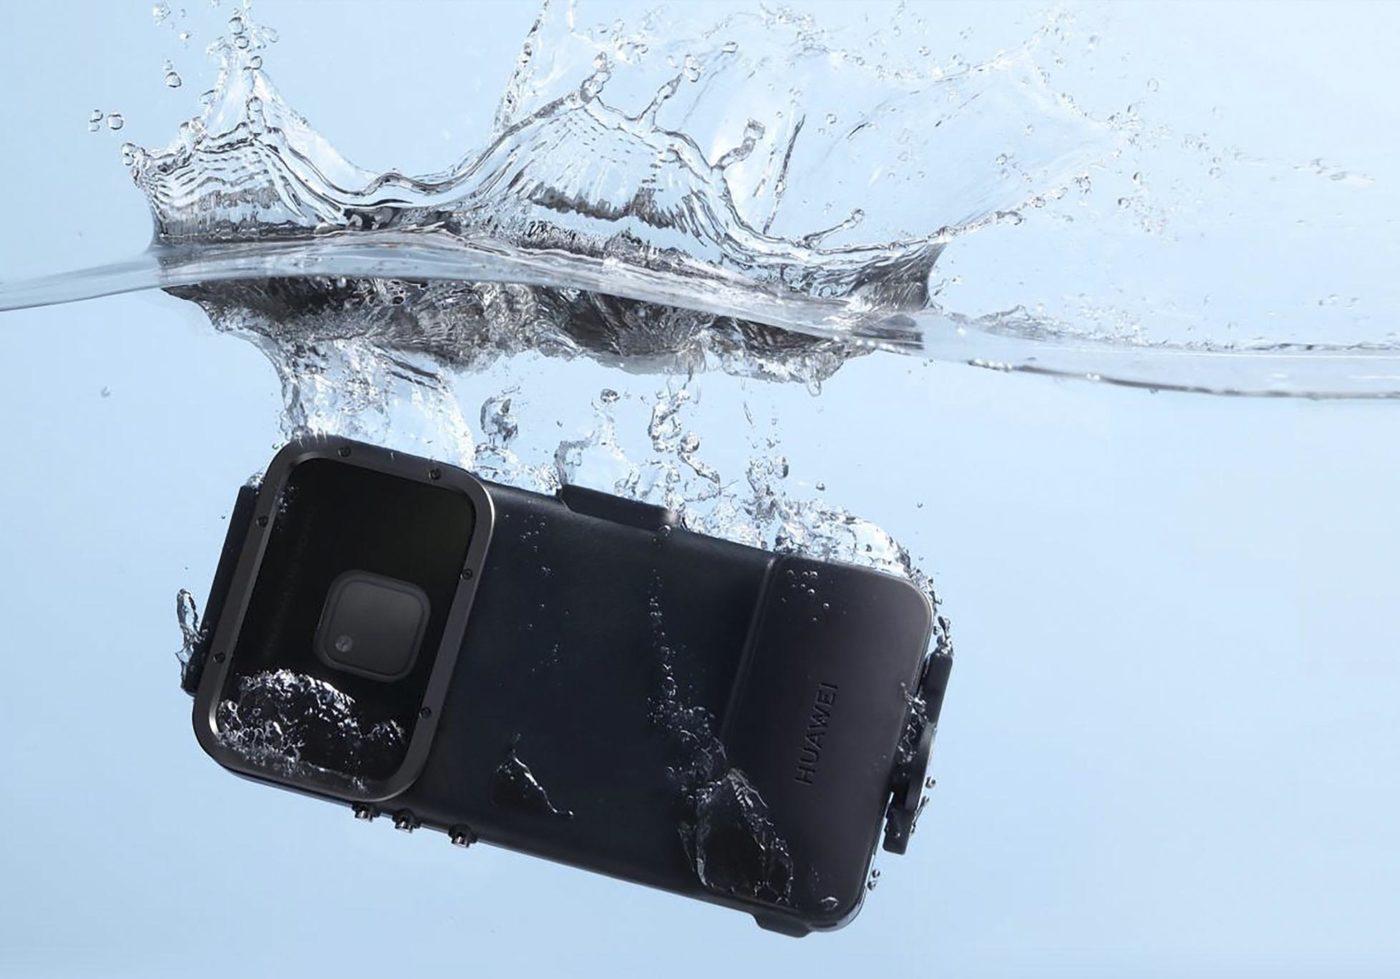 https://ilmigliorantivirus.com/wp-content/uploads/2019/02/fotocamera-smartphone-18.jpg